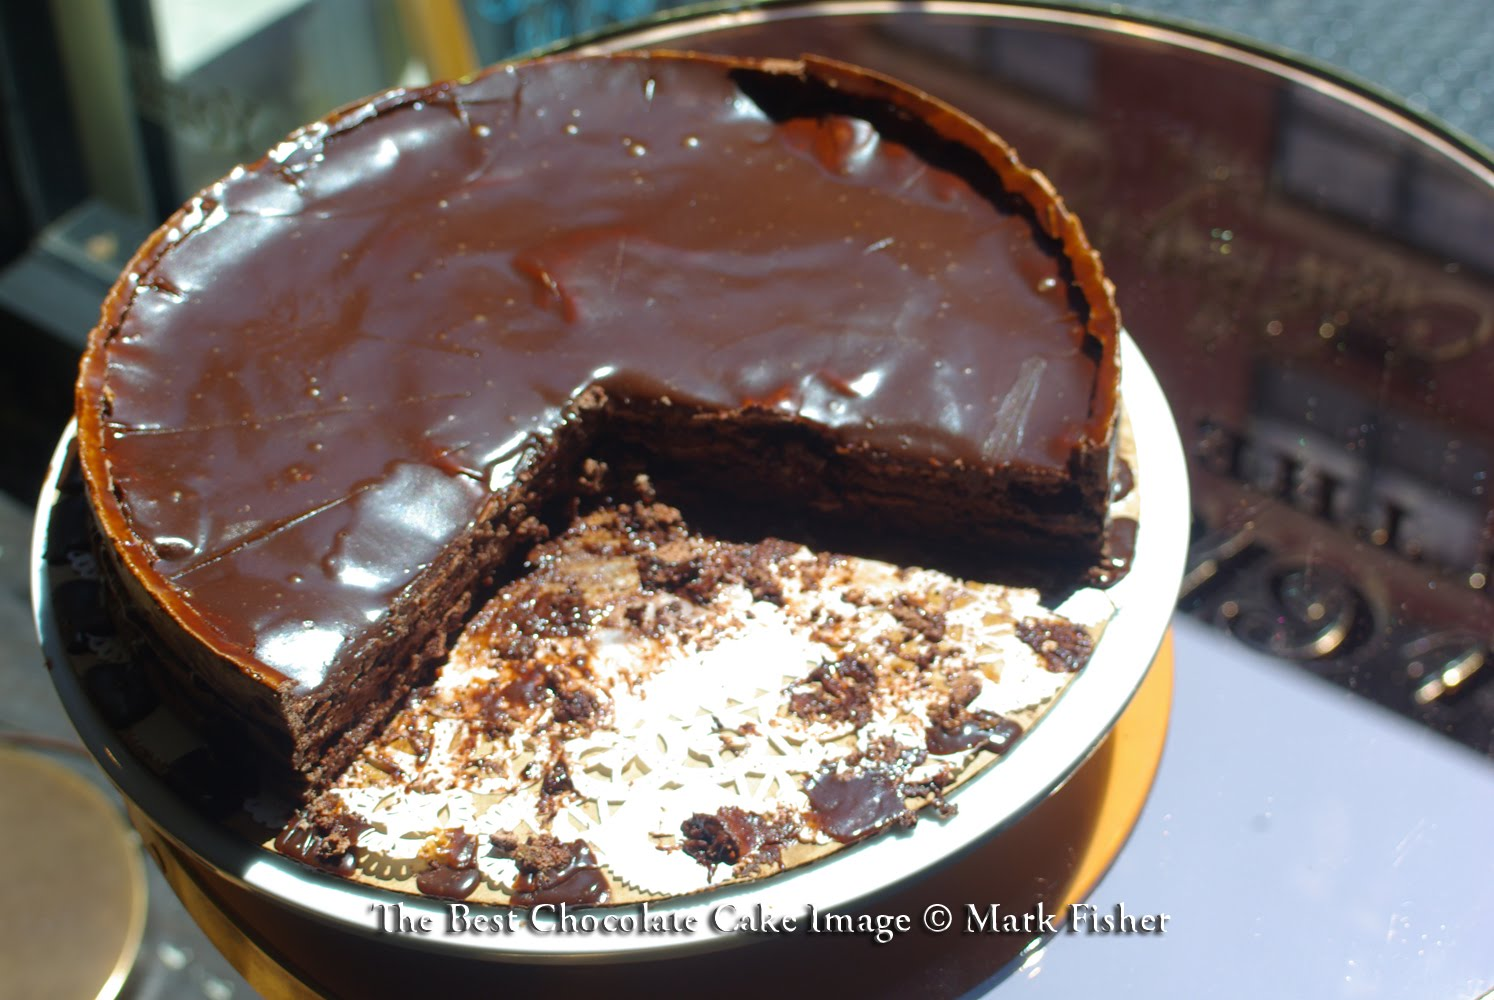 Enlightening Thunder Mark Fisher S Image The Best Chocolate Cake